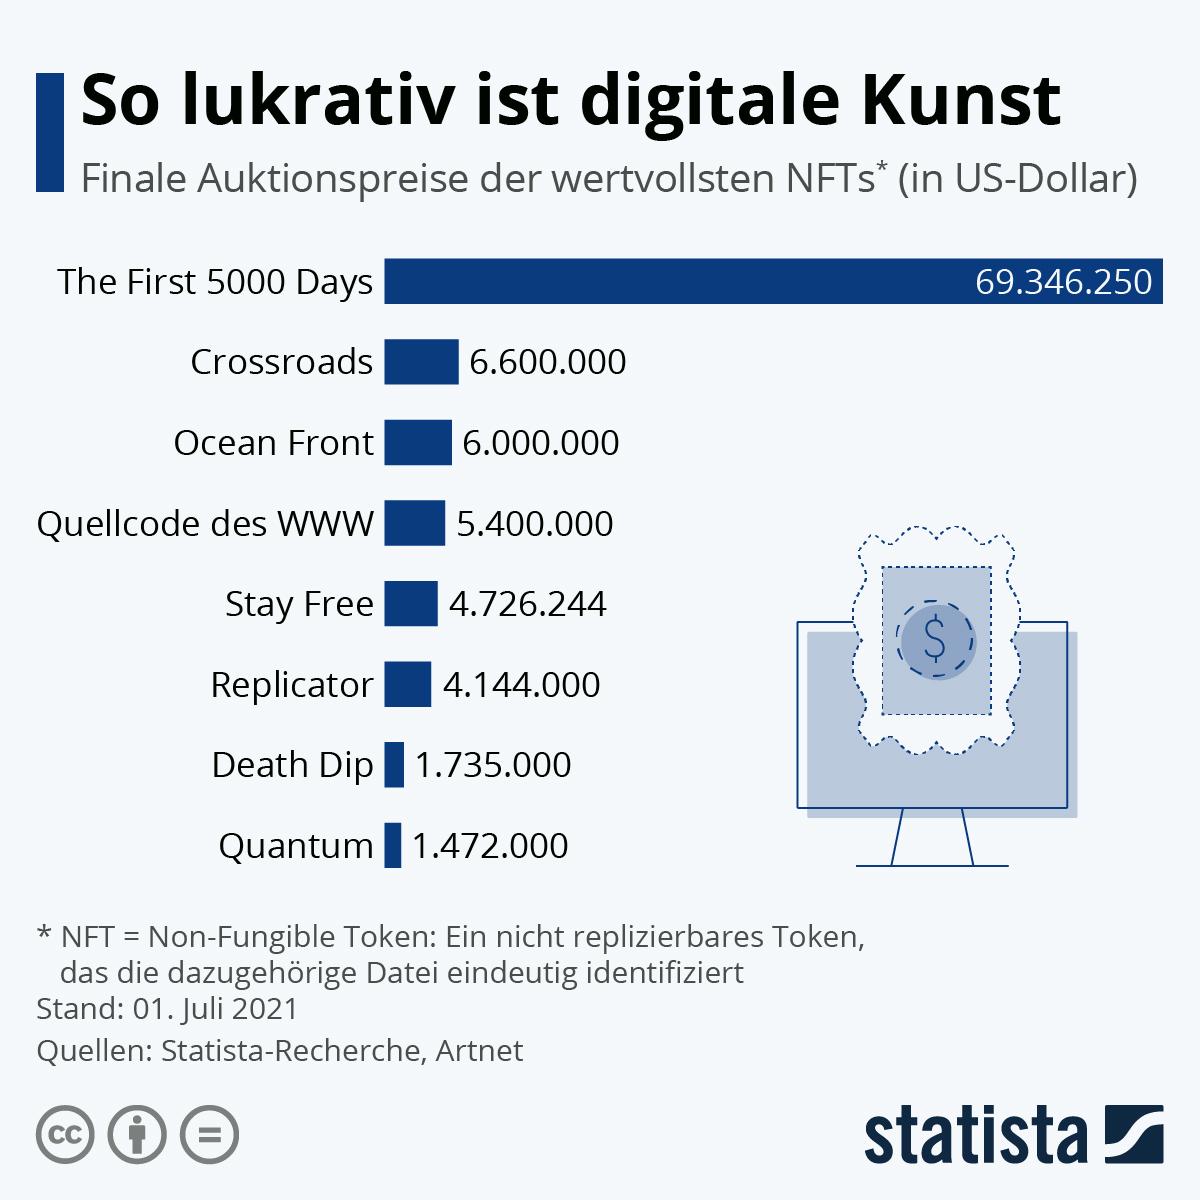 Infografik: So lukrativ ist digitale Kunst | Statista